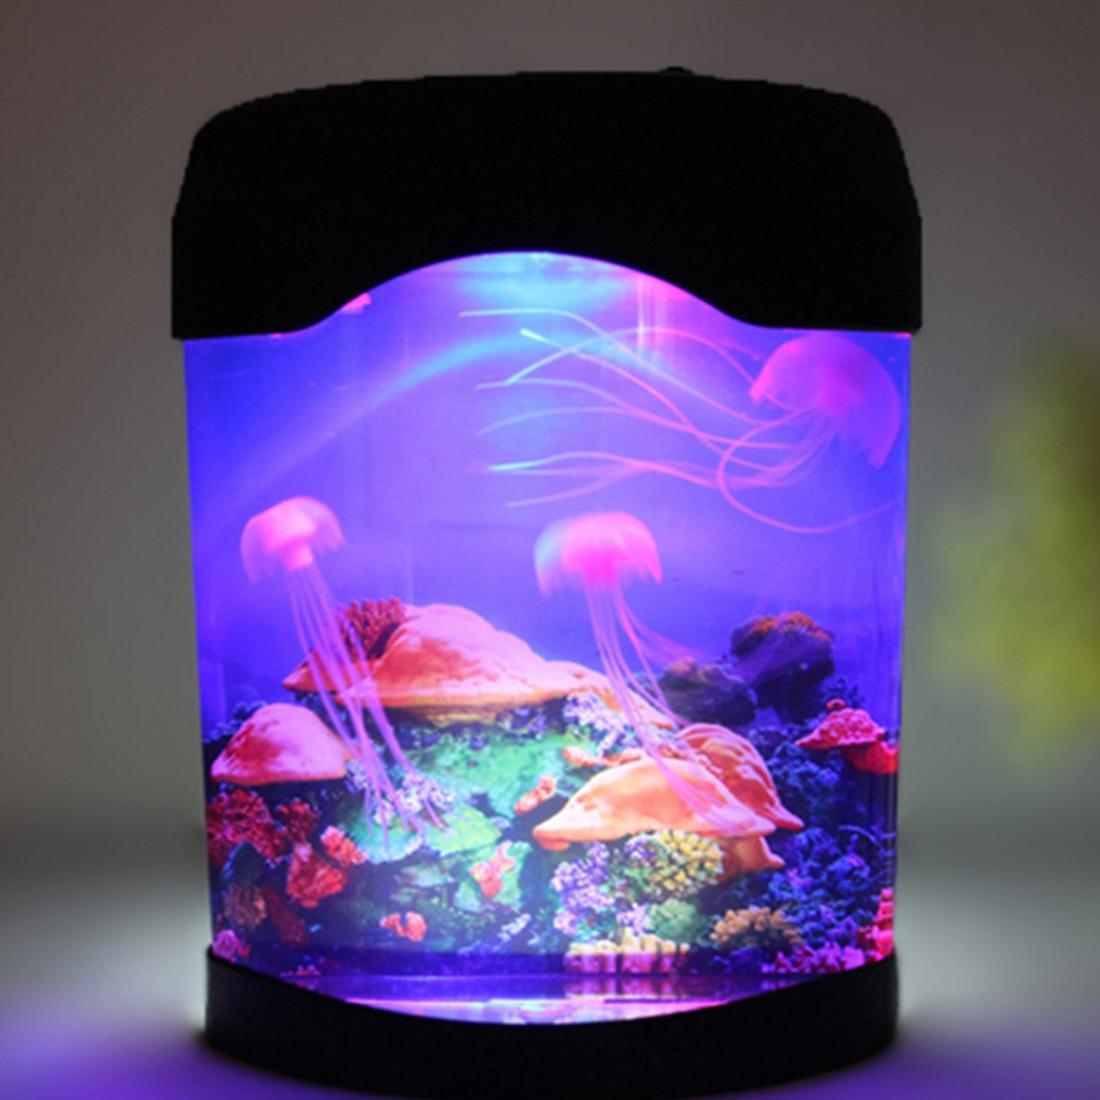 led criativo aquario luz da noite duravel 02